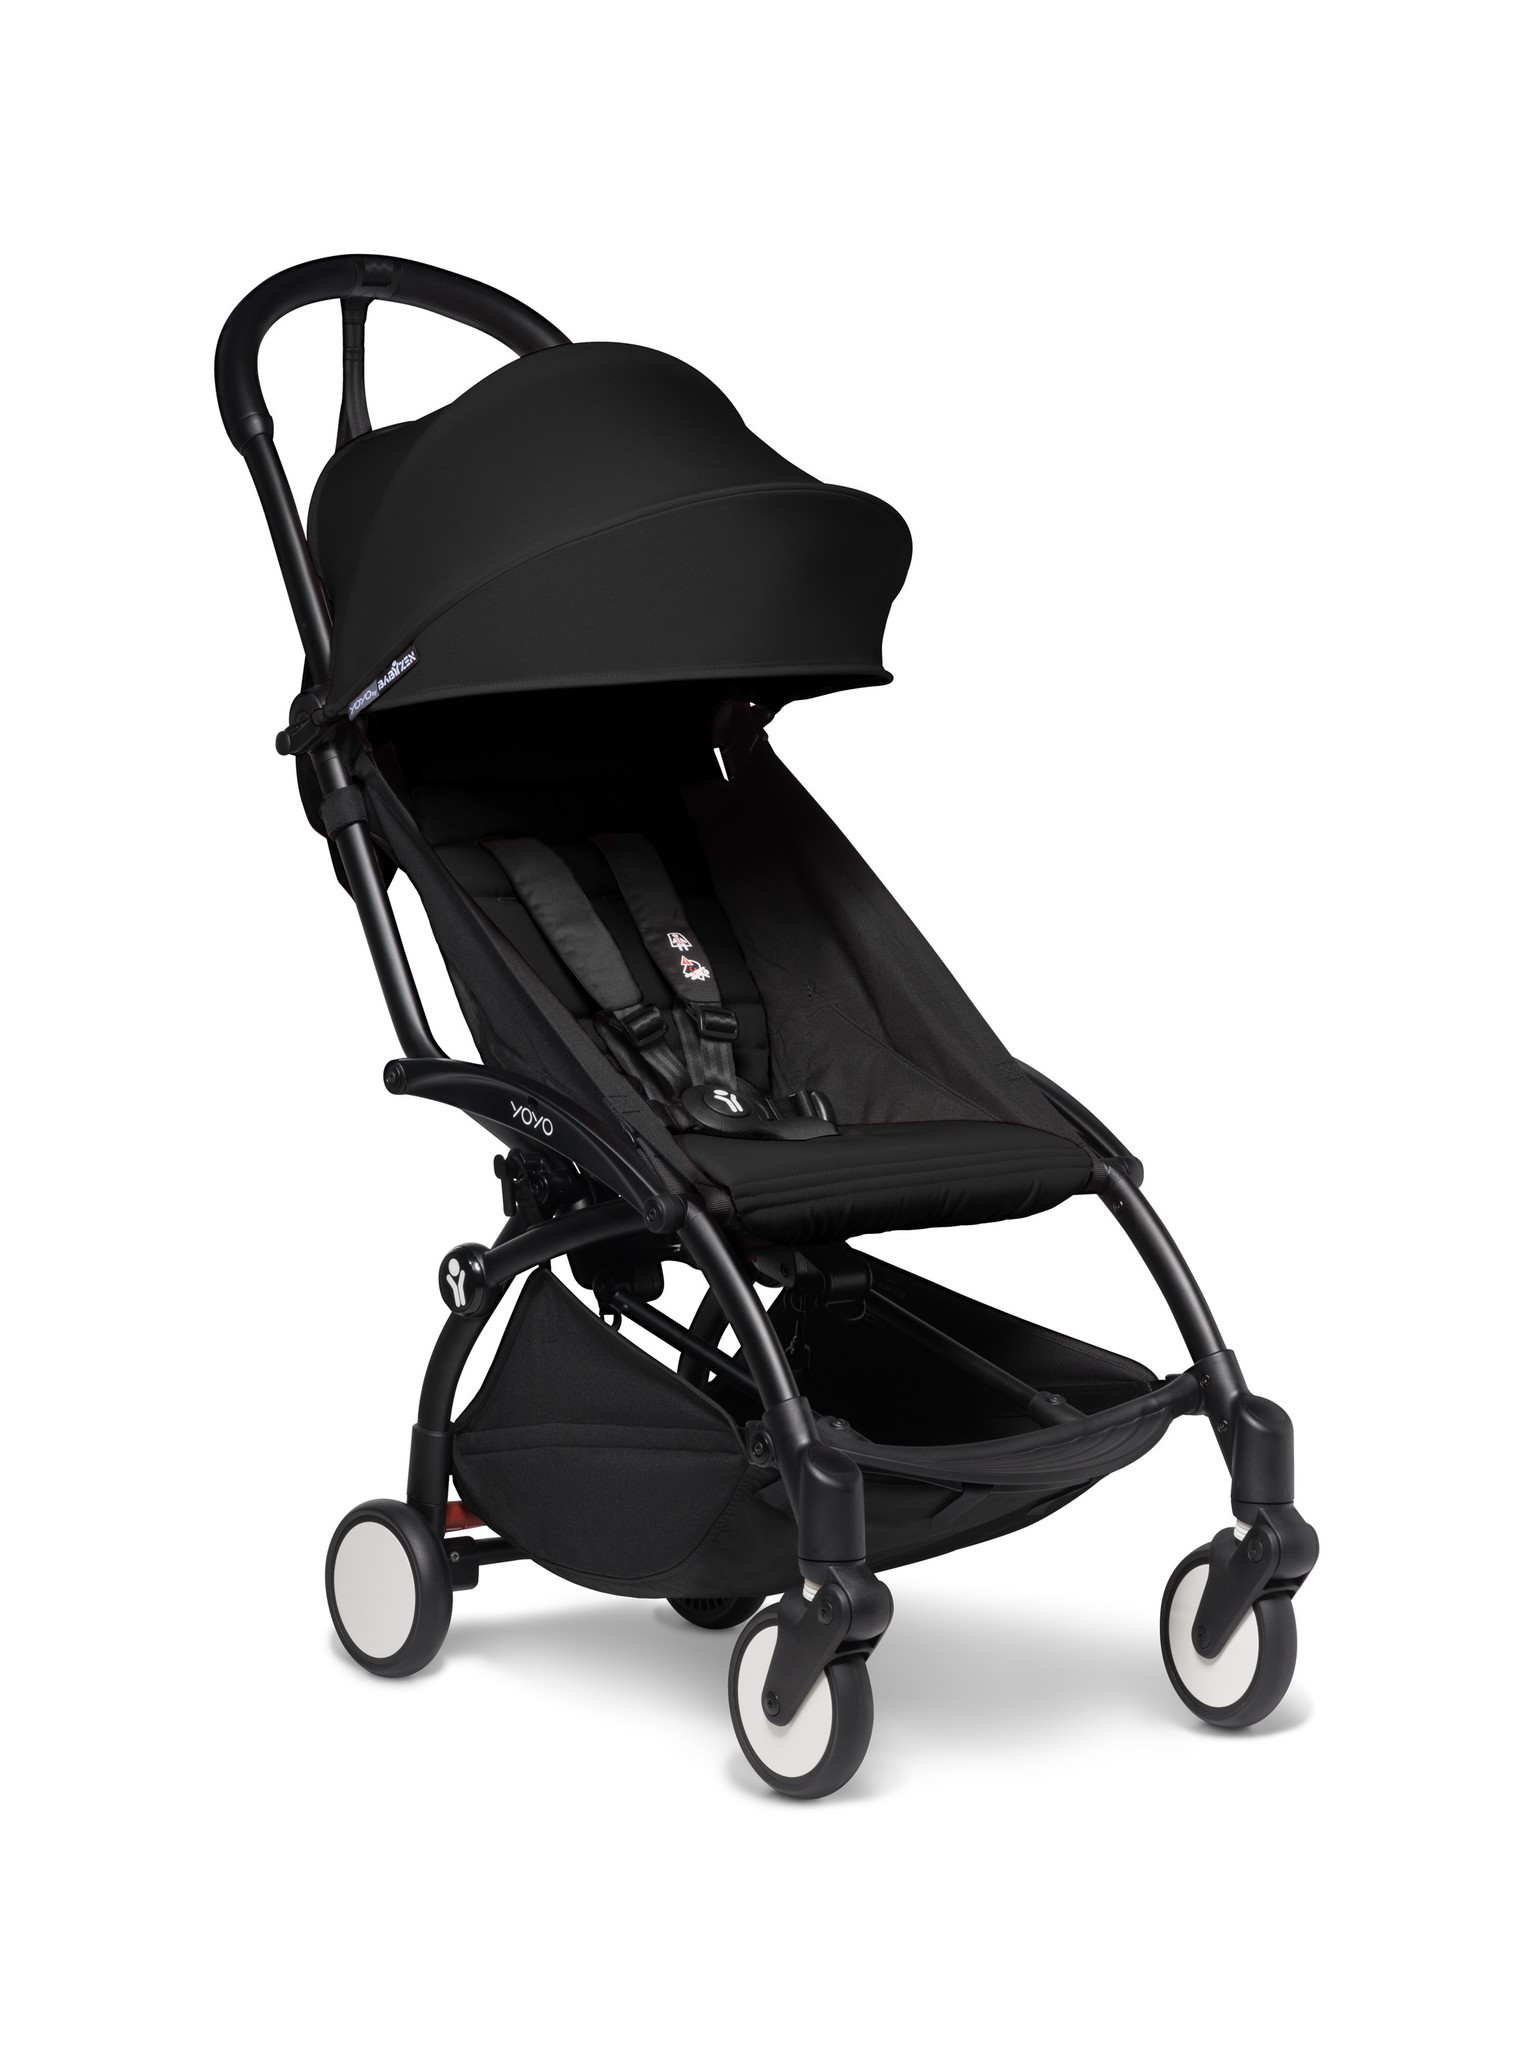 Babyzen Babyzen YOYO² buggy COMPLEET / FULL SET 0+ and 6+ zwart frame zwart